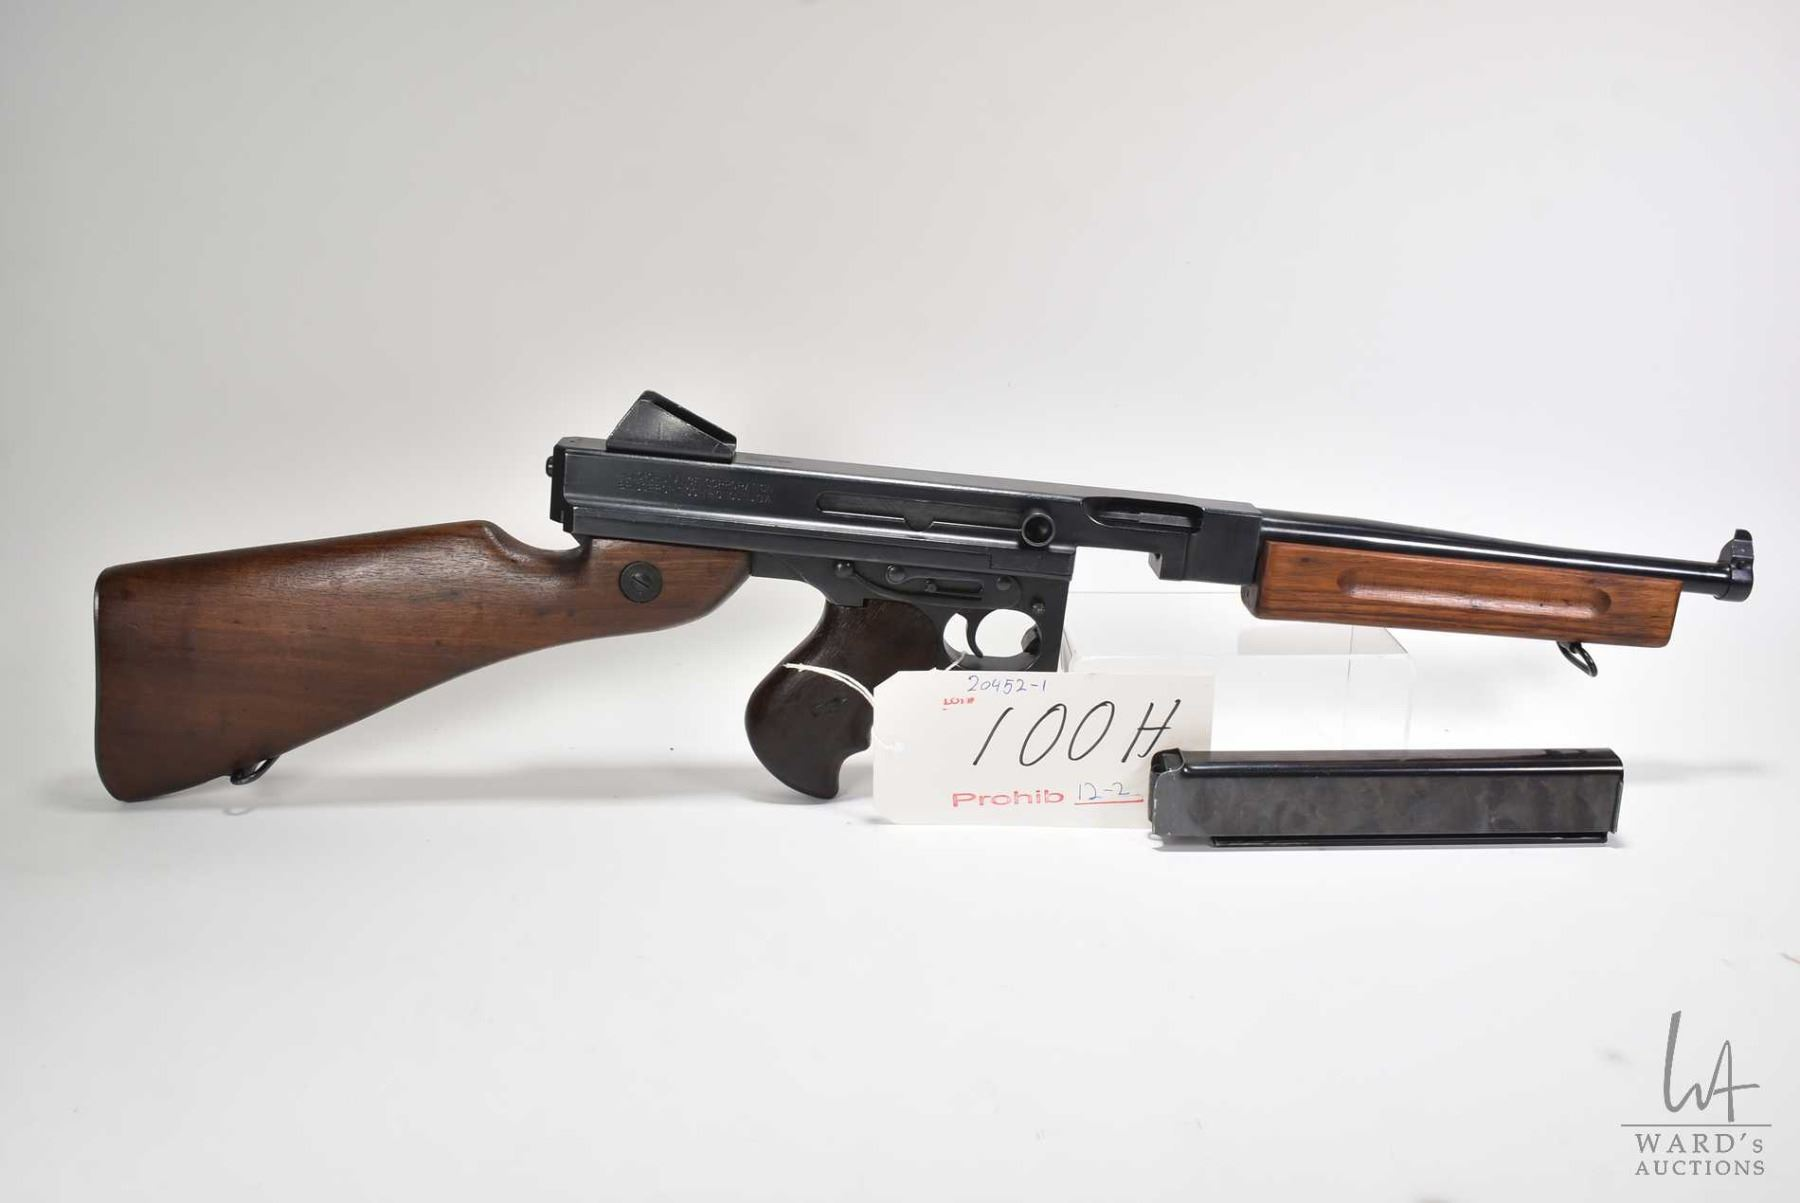 https://www.icollector.com/Prohib-12-2-rifle-Thompson-model-M1A1-45ACP-5-Shot-full-automatic-w-bbl-length-267mm-Blued-barr_i37767787